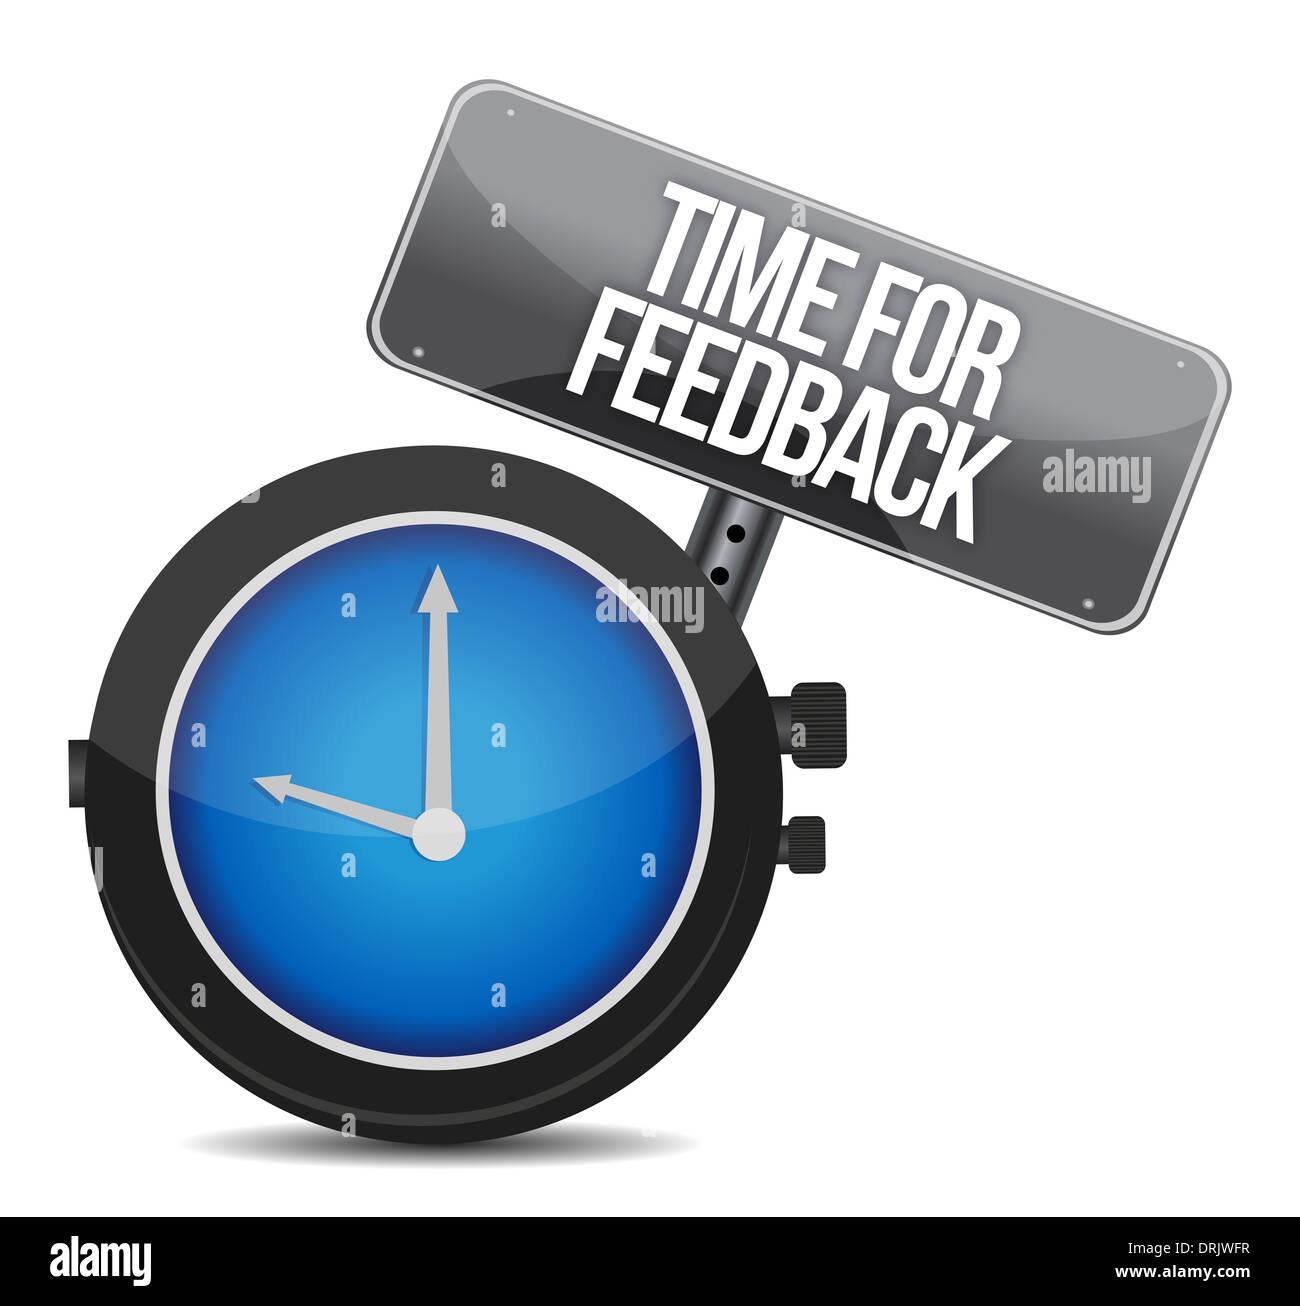 time for feedback illustration design over white - Stock Image